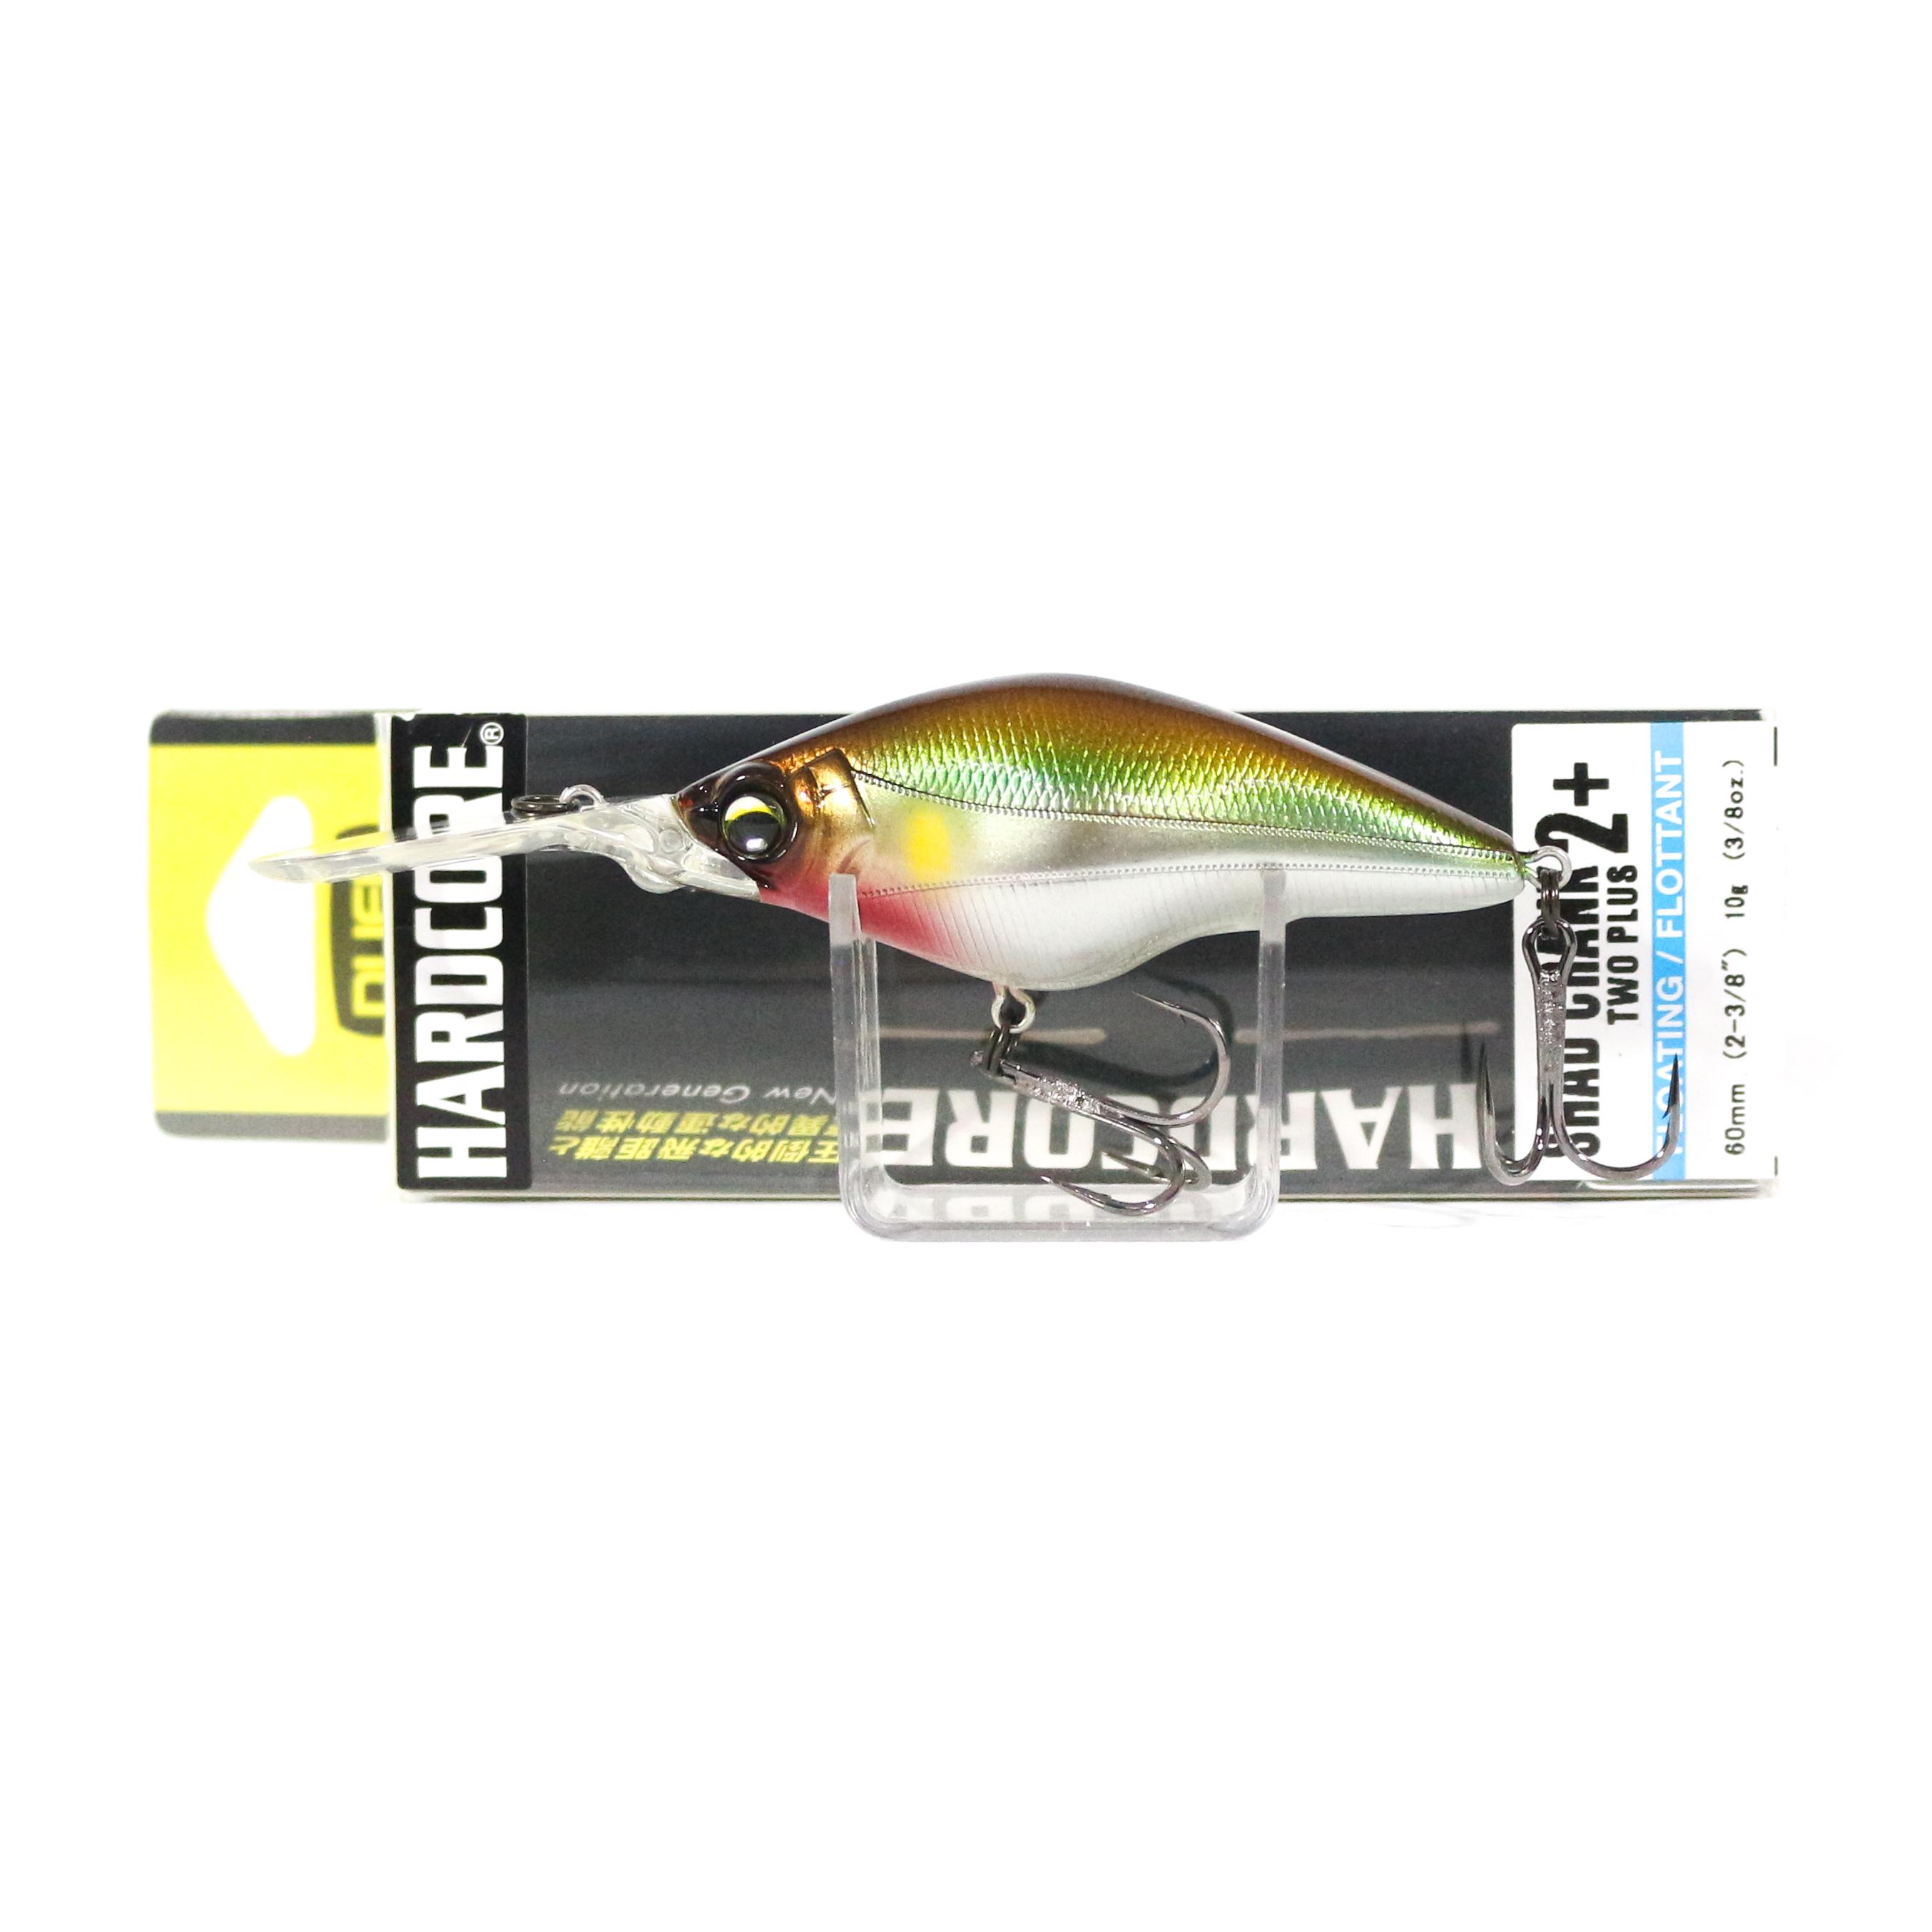 Yo Zuri Duel Hardcore Shad Crank 2+ 60F Floating Lure R1185-MGSA (9584)